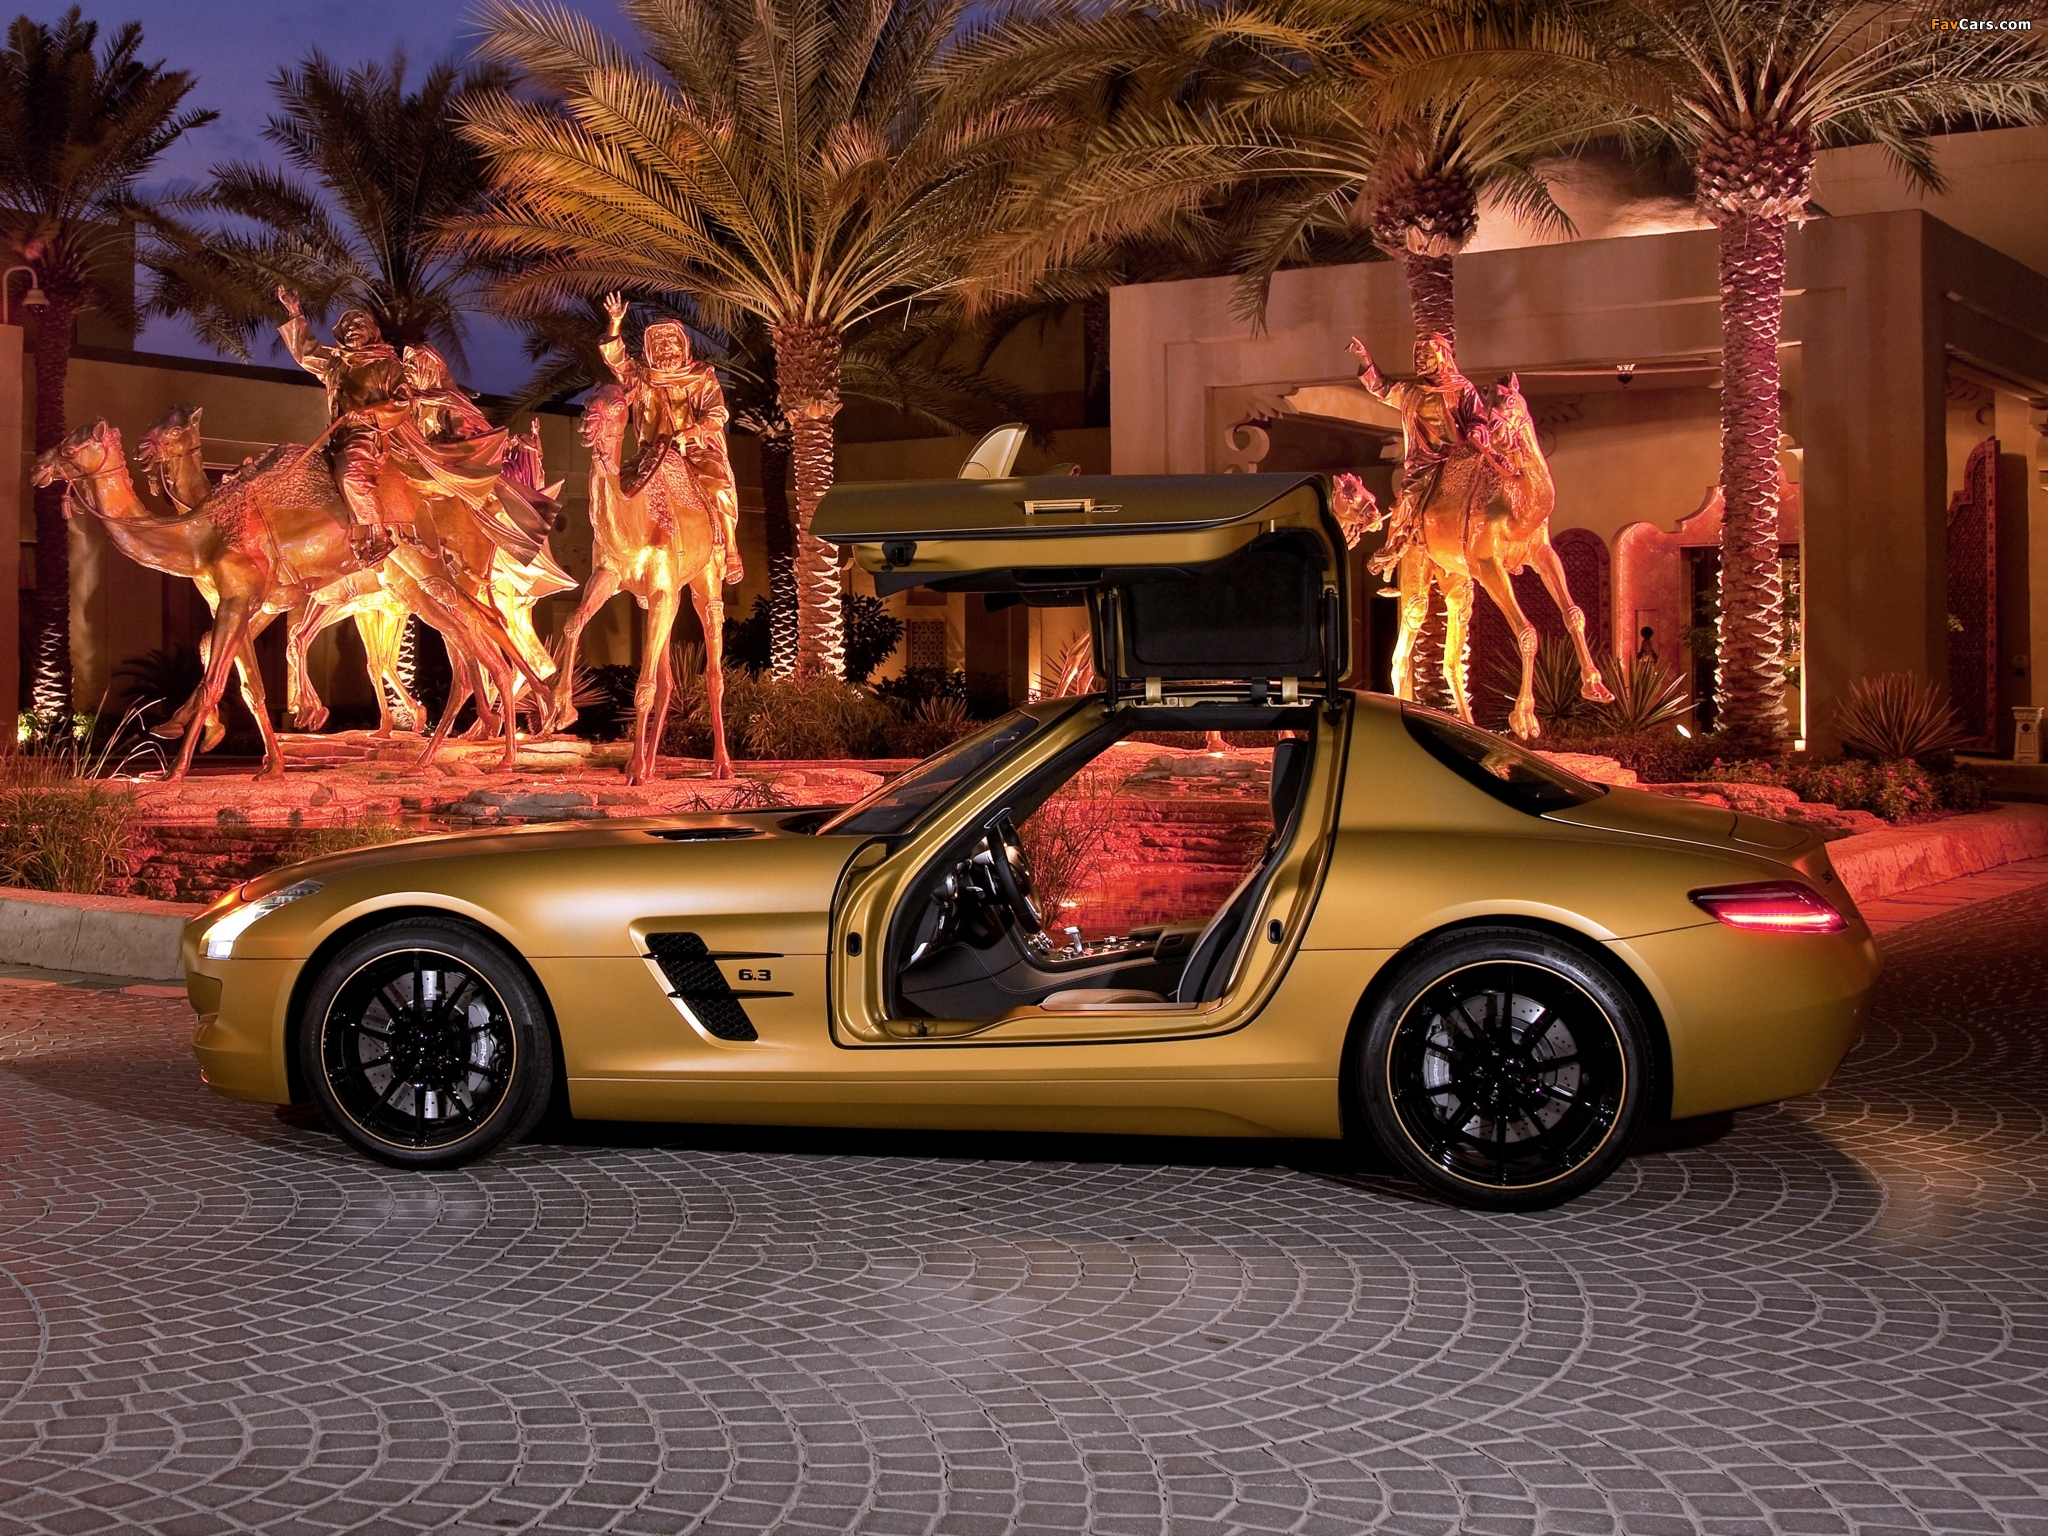 Mercedes-Benz SLS 63 AMG Desert Gold (C197) 2010 pictures (2048 x 1536)